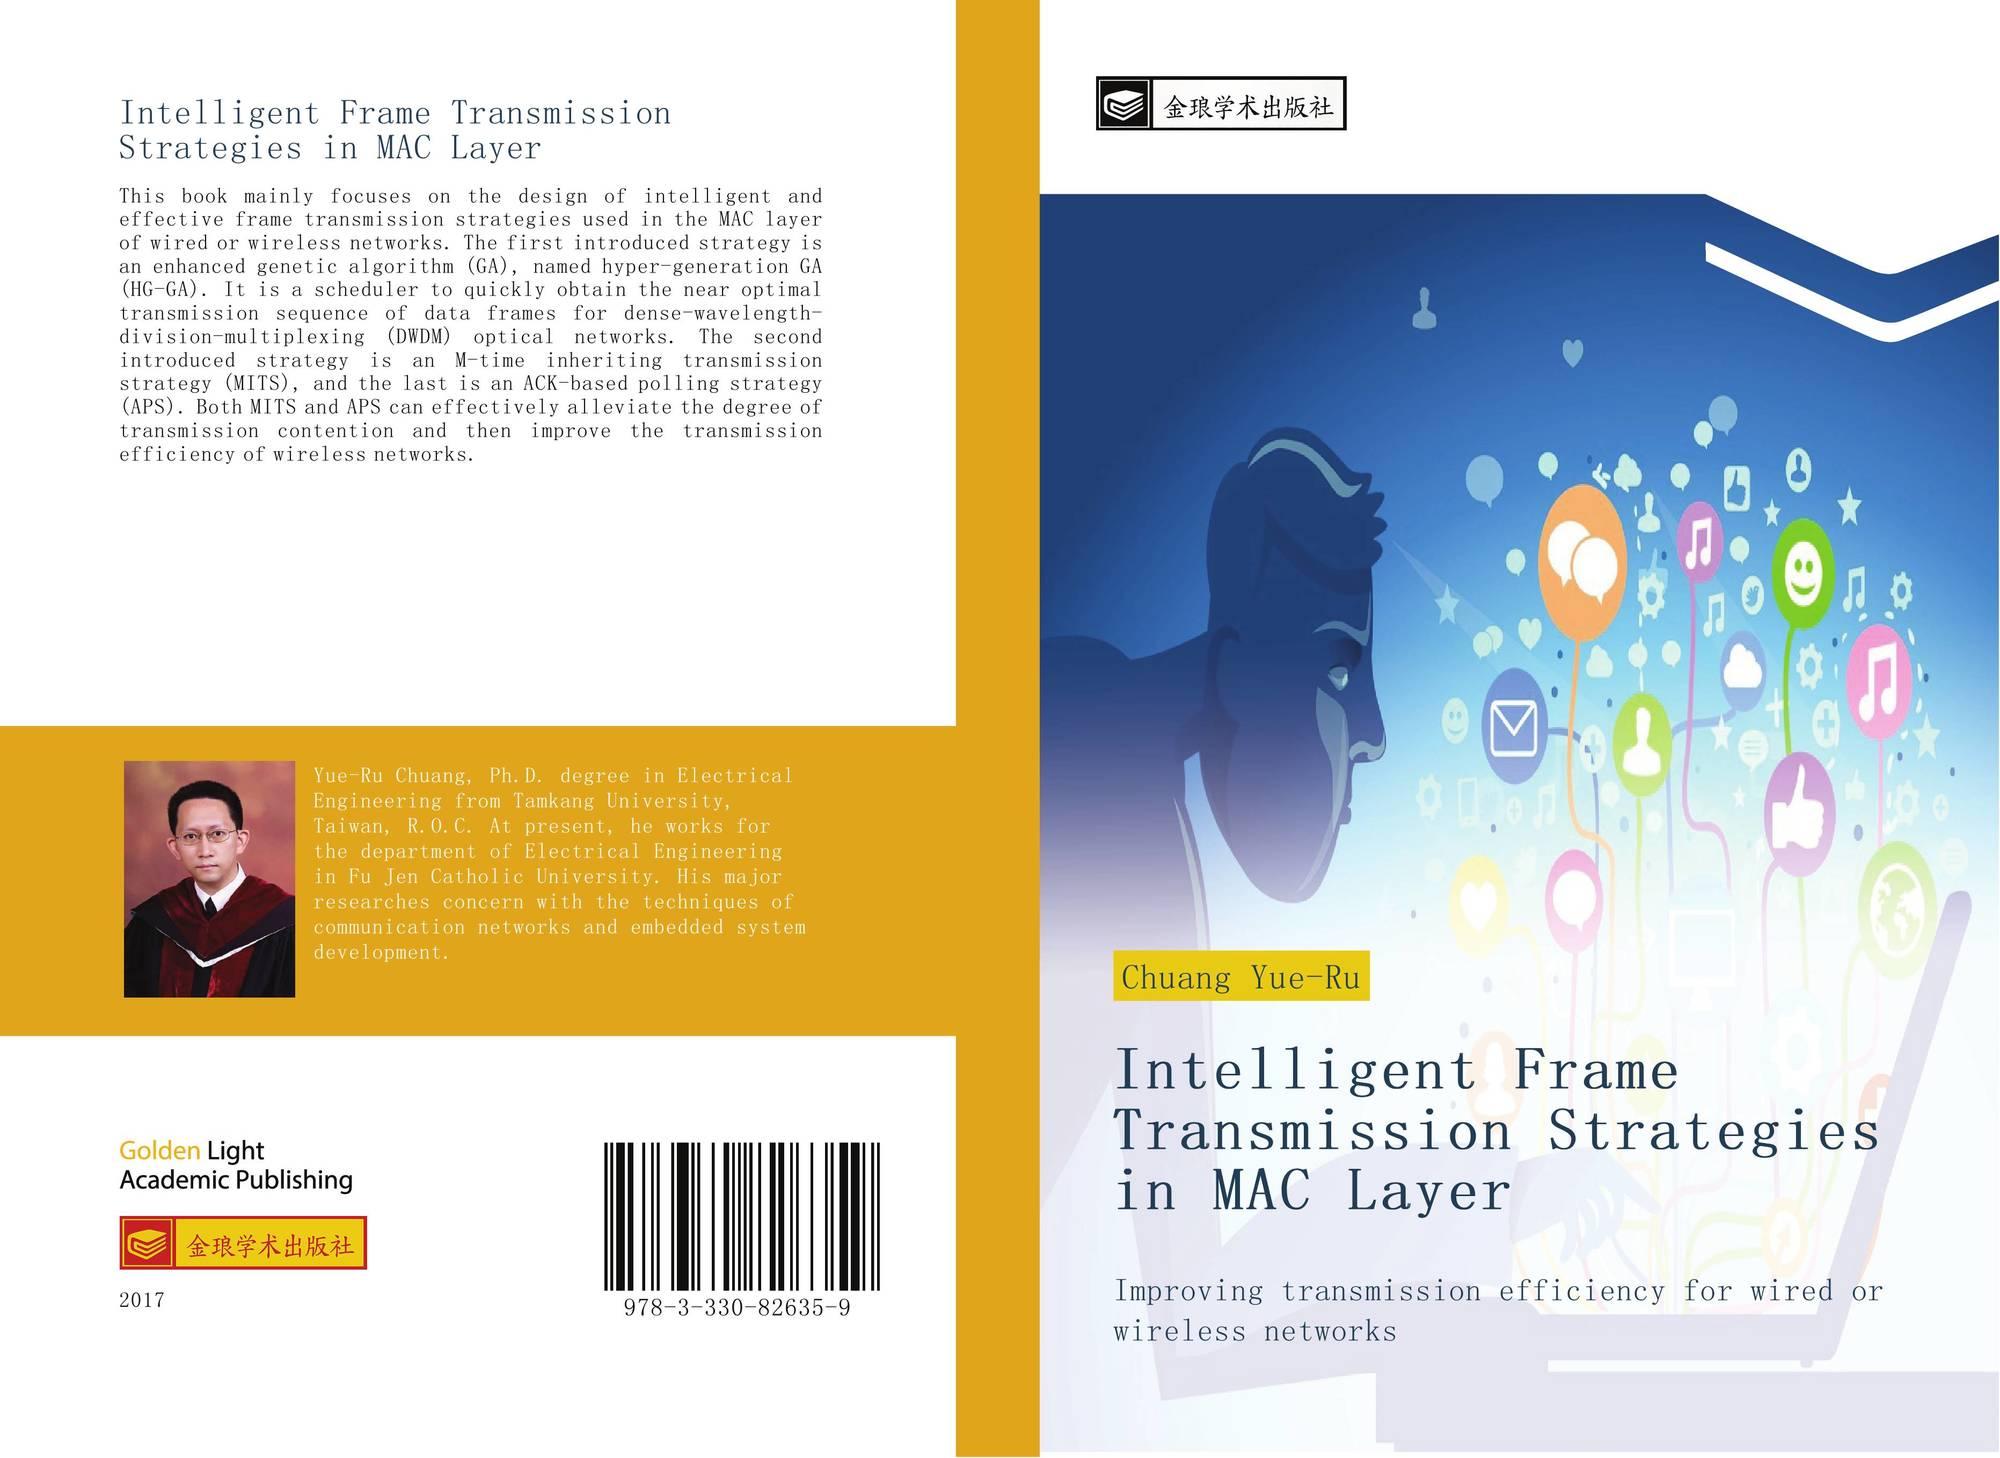 Intelligent Frame Transmission Strategies in MAC Layer, 978